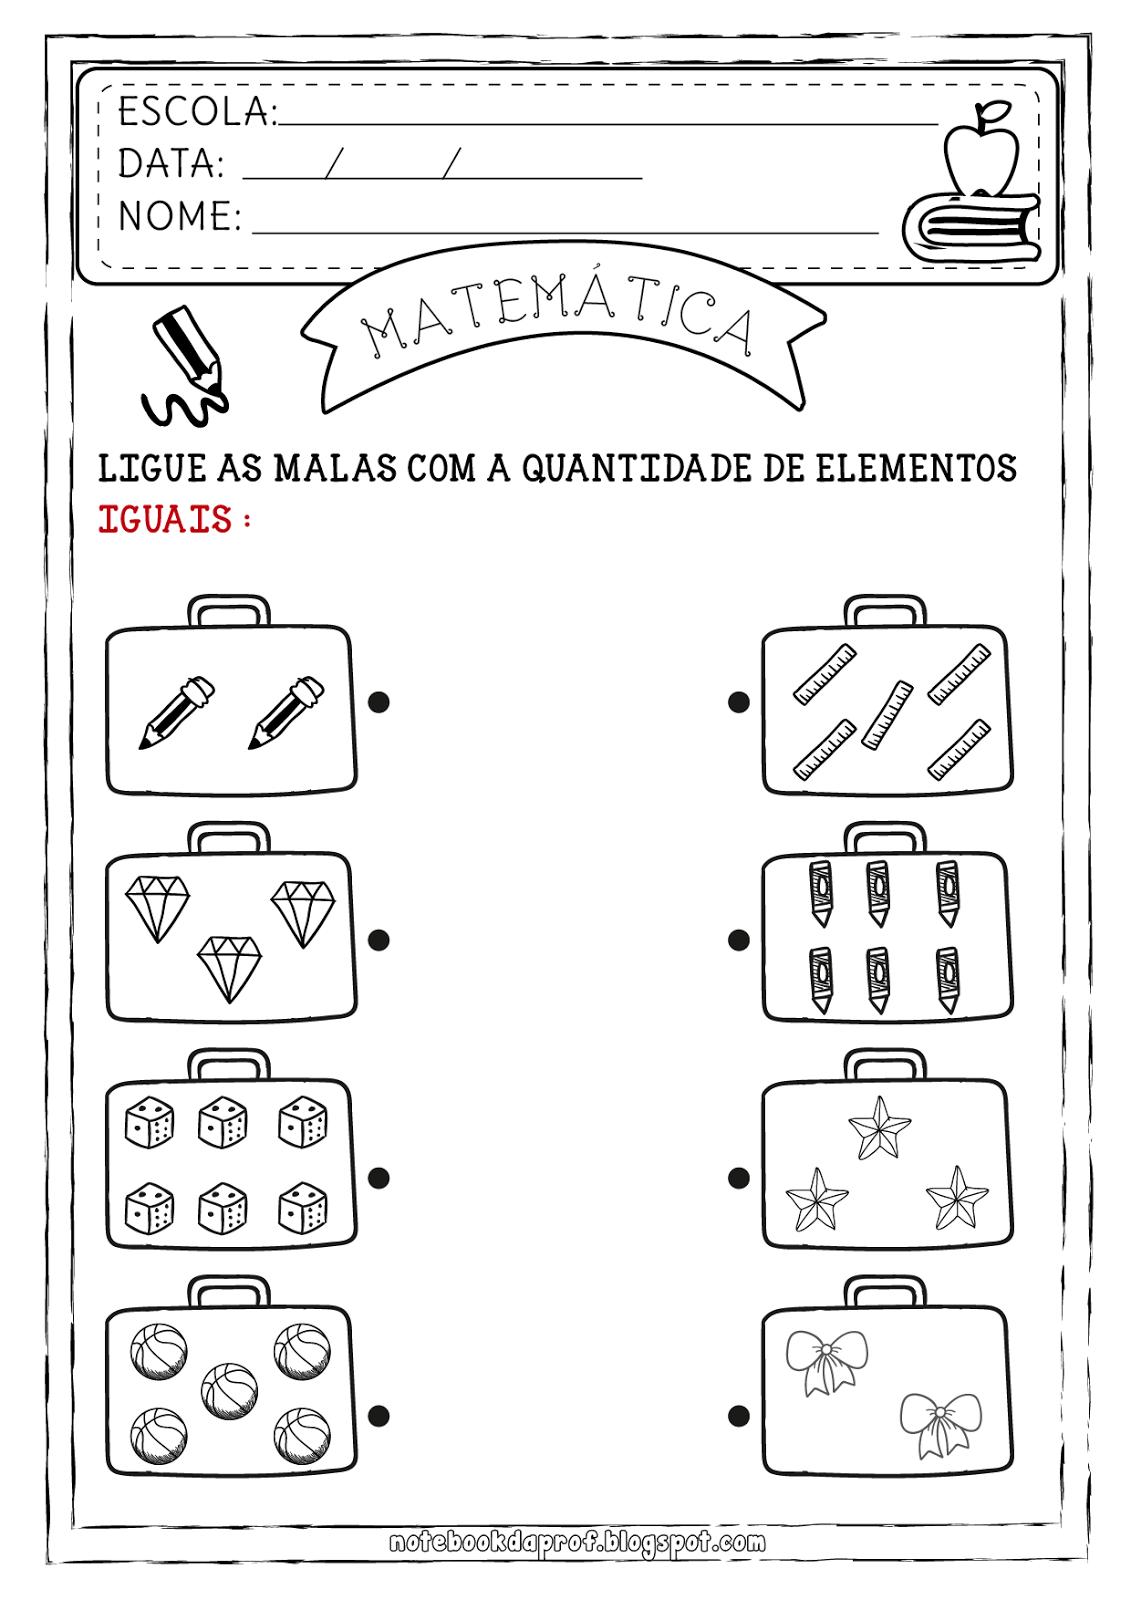 Notebook Da Profa Atividades De Matematica